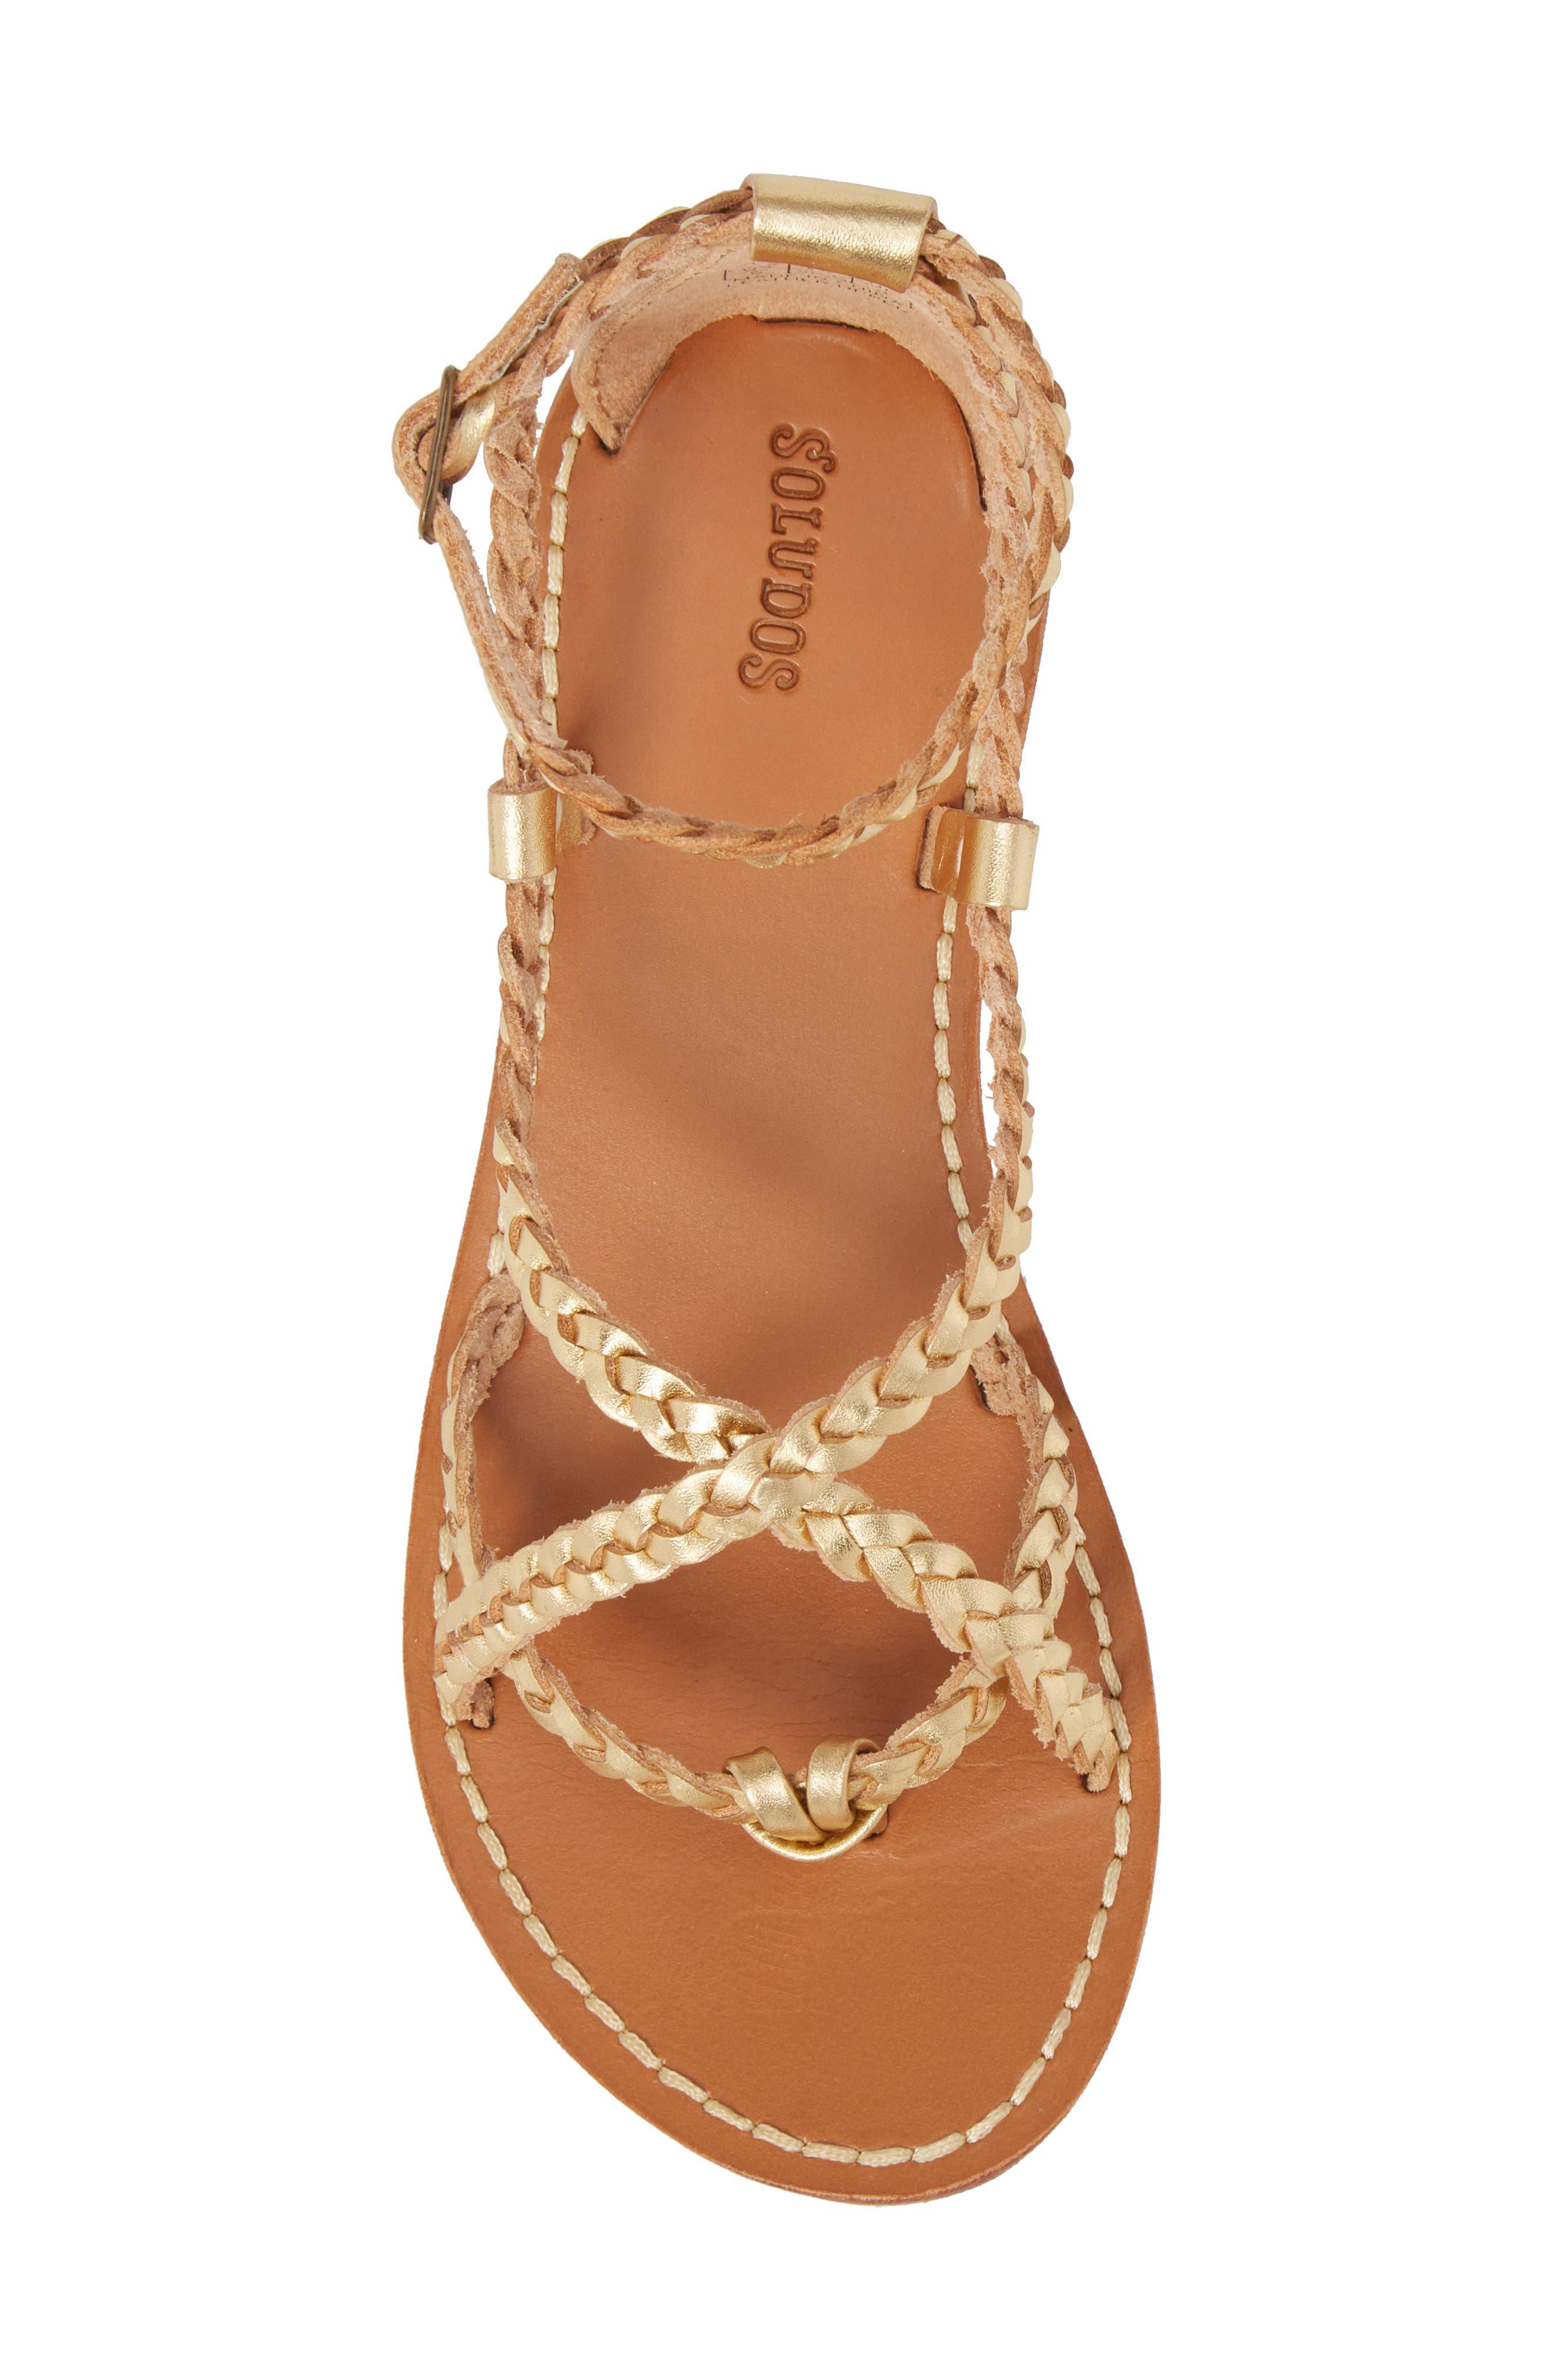 Amalfi Braided Metallic Sandal,                             Alternate thumbnail 5, color,                             710